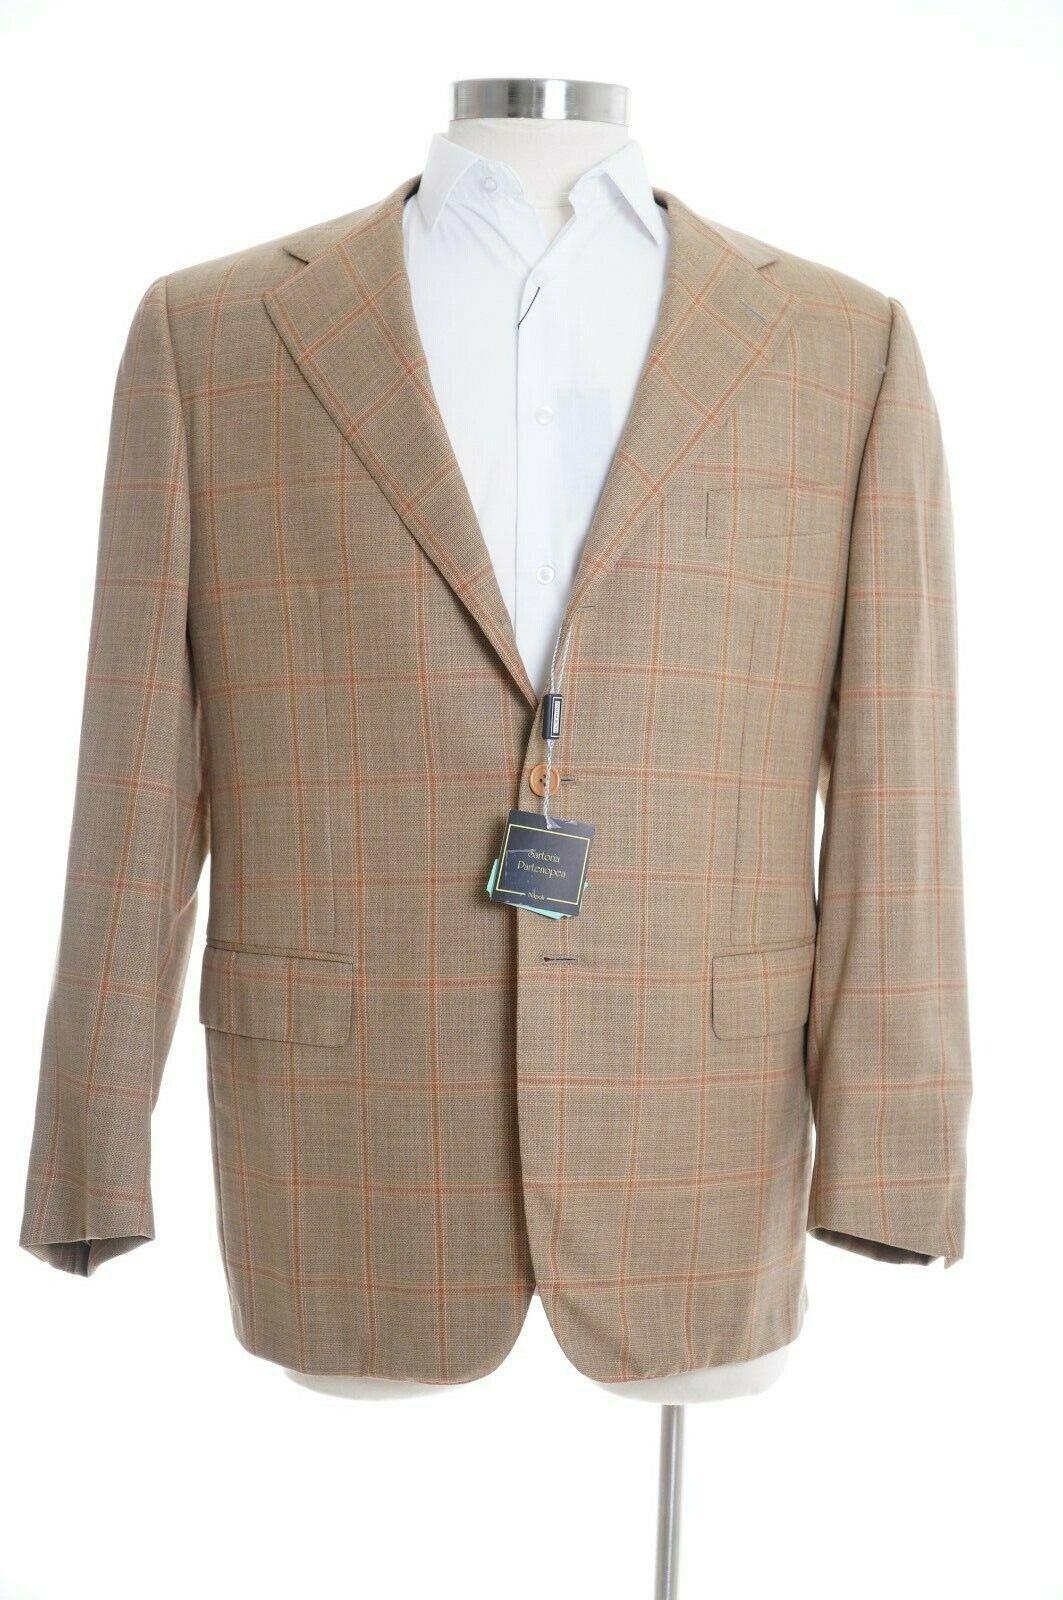 K Sartoria Partenopea  Camel Windowpane Plaid 42R 100% Wool Blazer